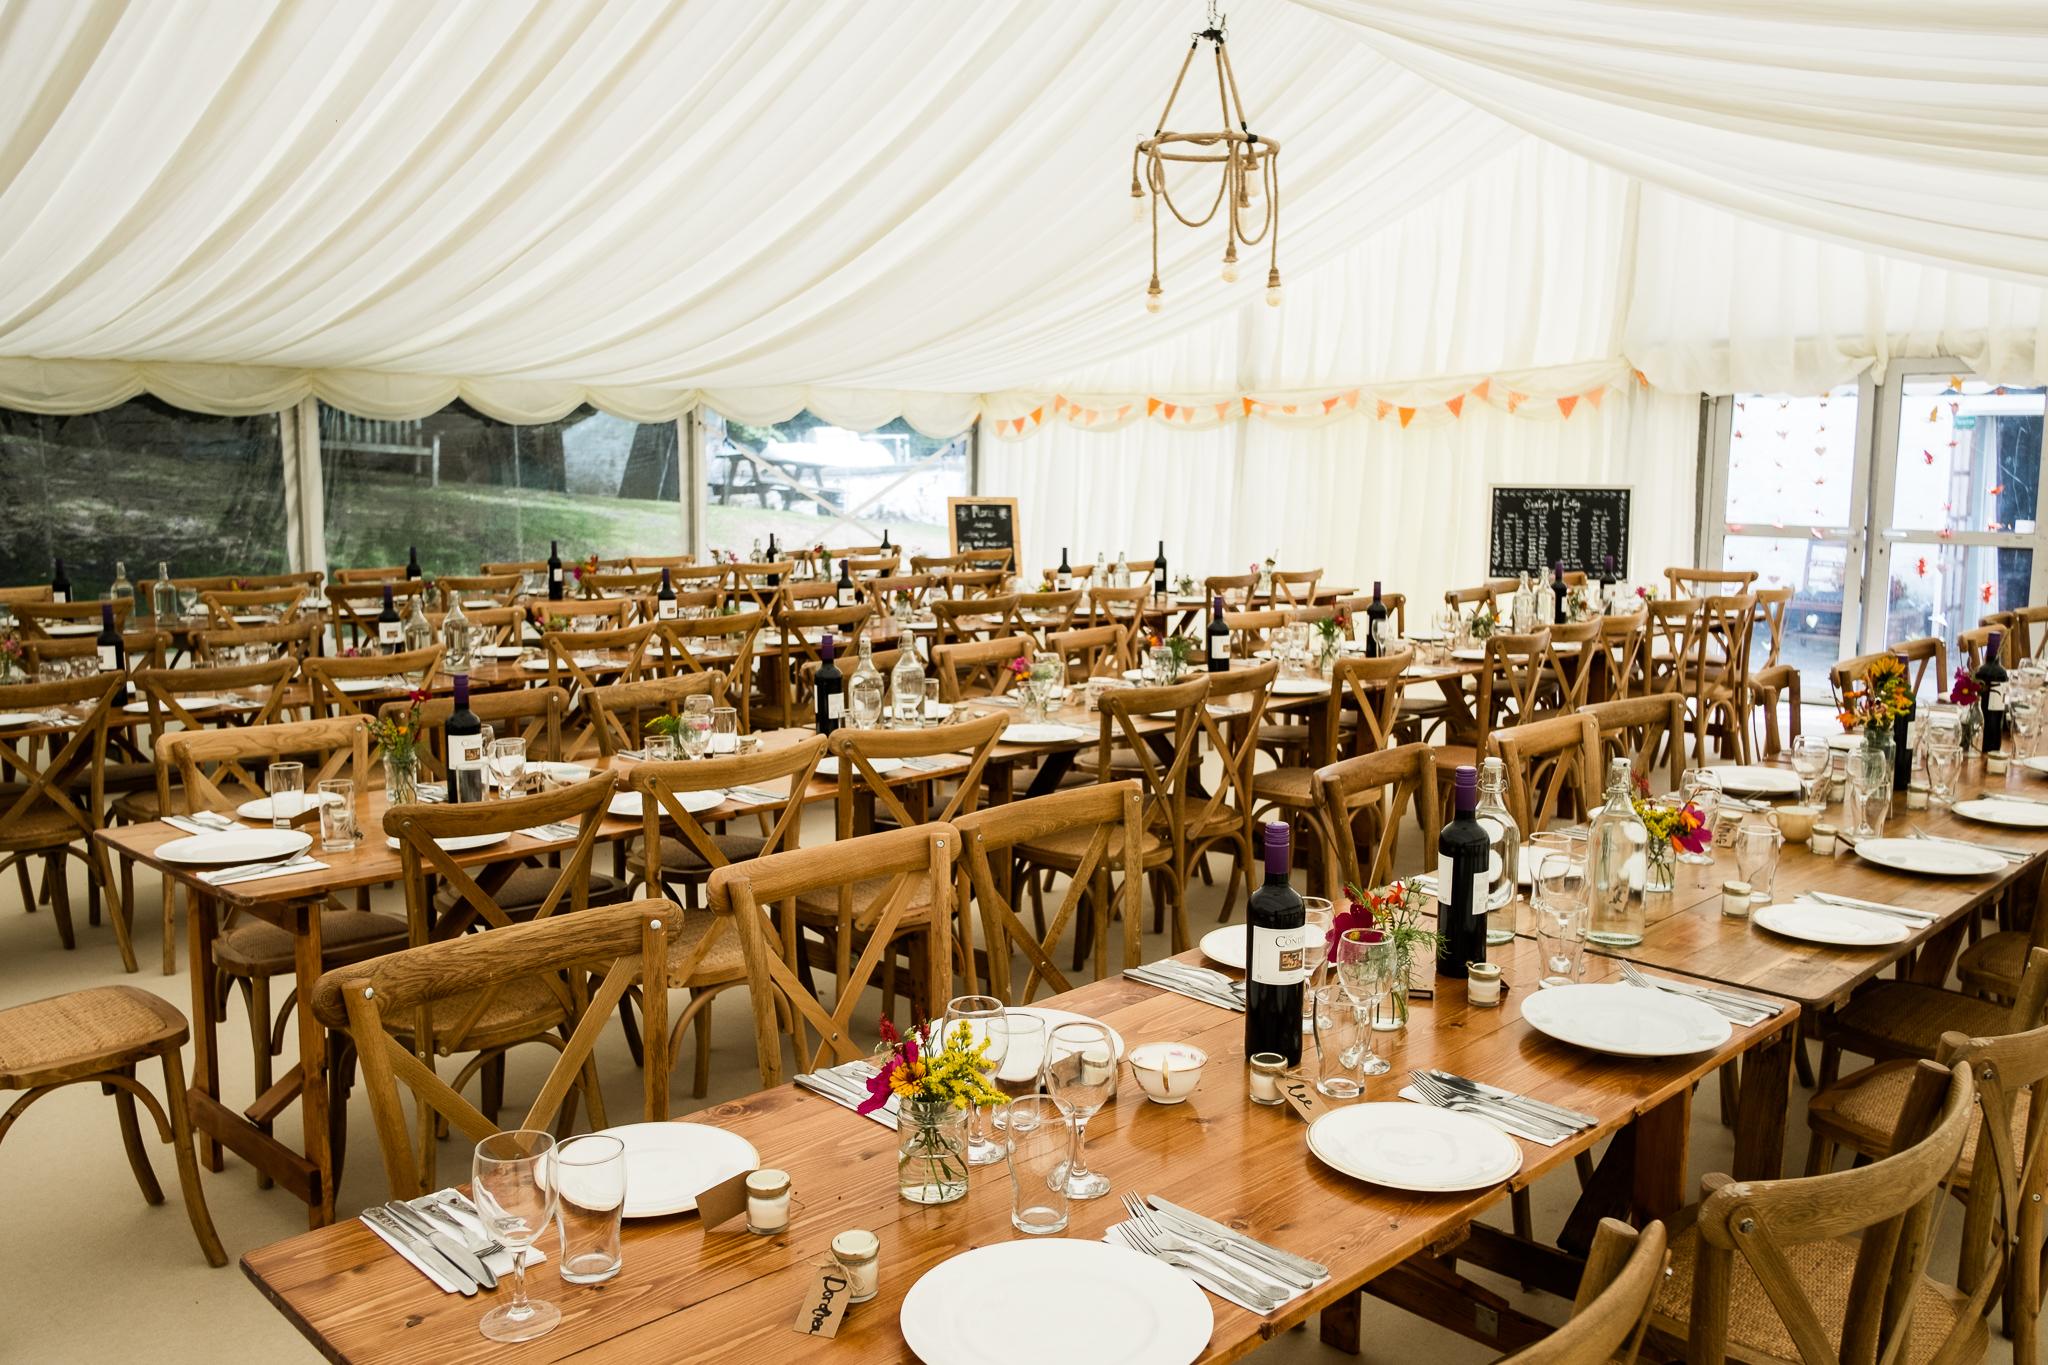 Relaxed Documentary Wedding Photography at The Wizard Inn, Alderley Edge Cheshire - Jenny Harper-49.jpg